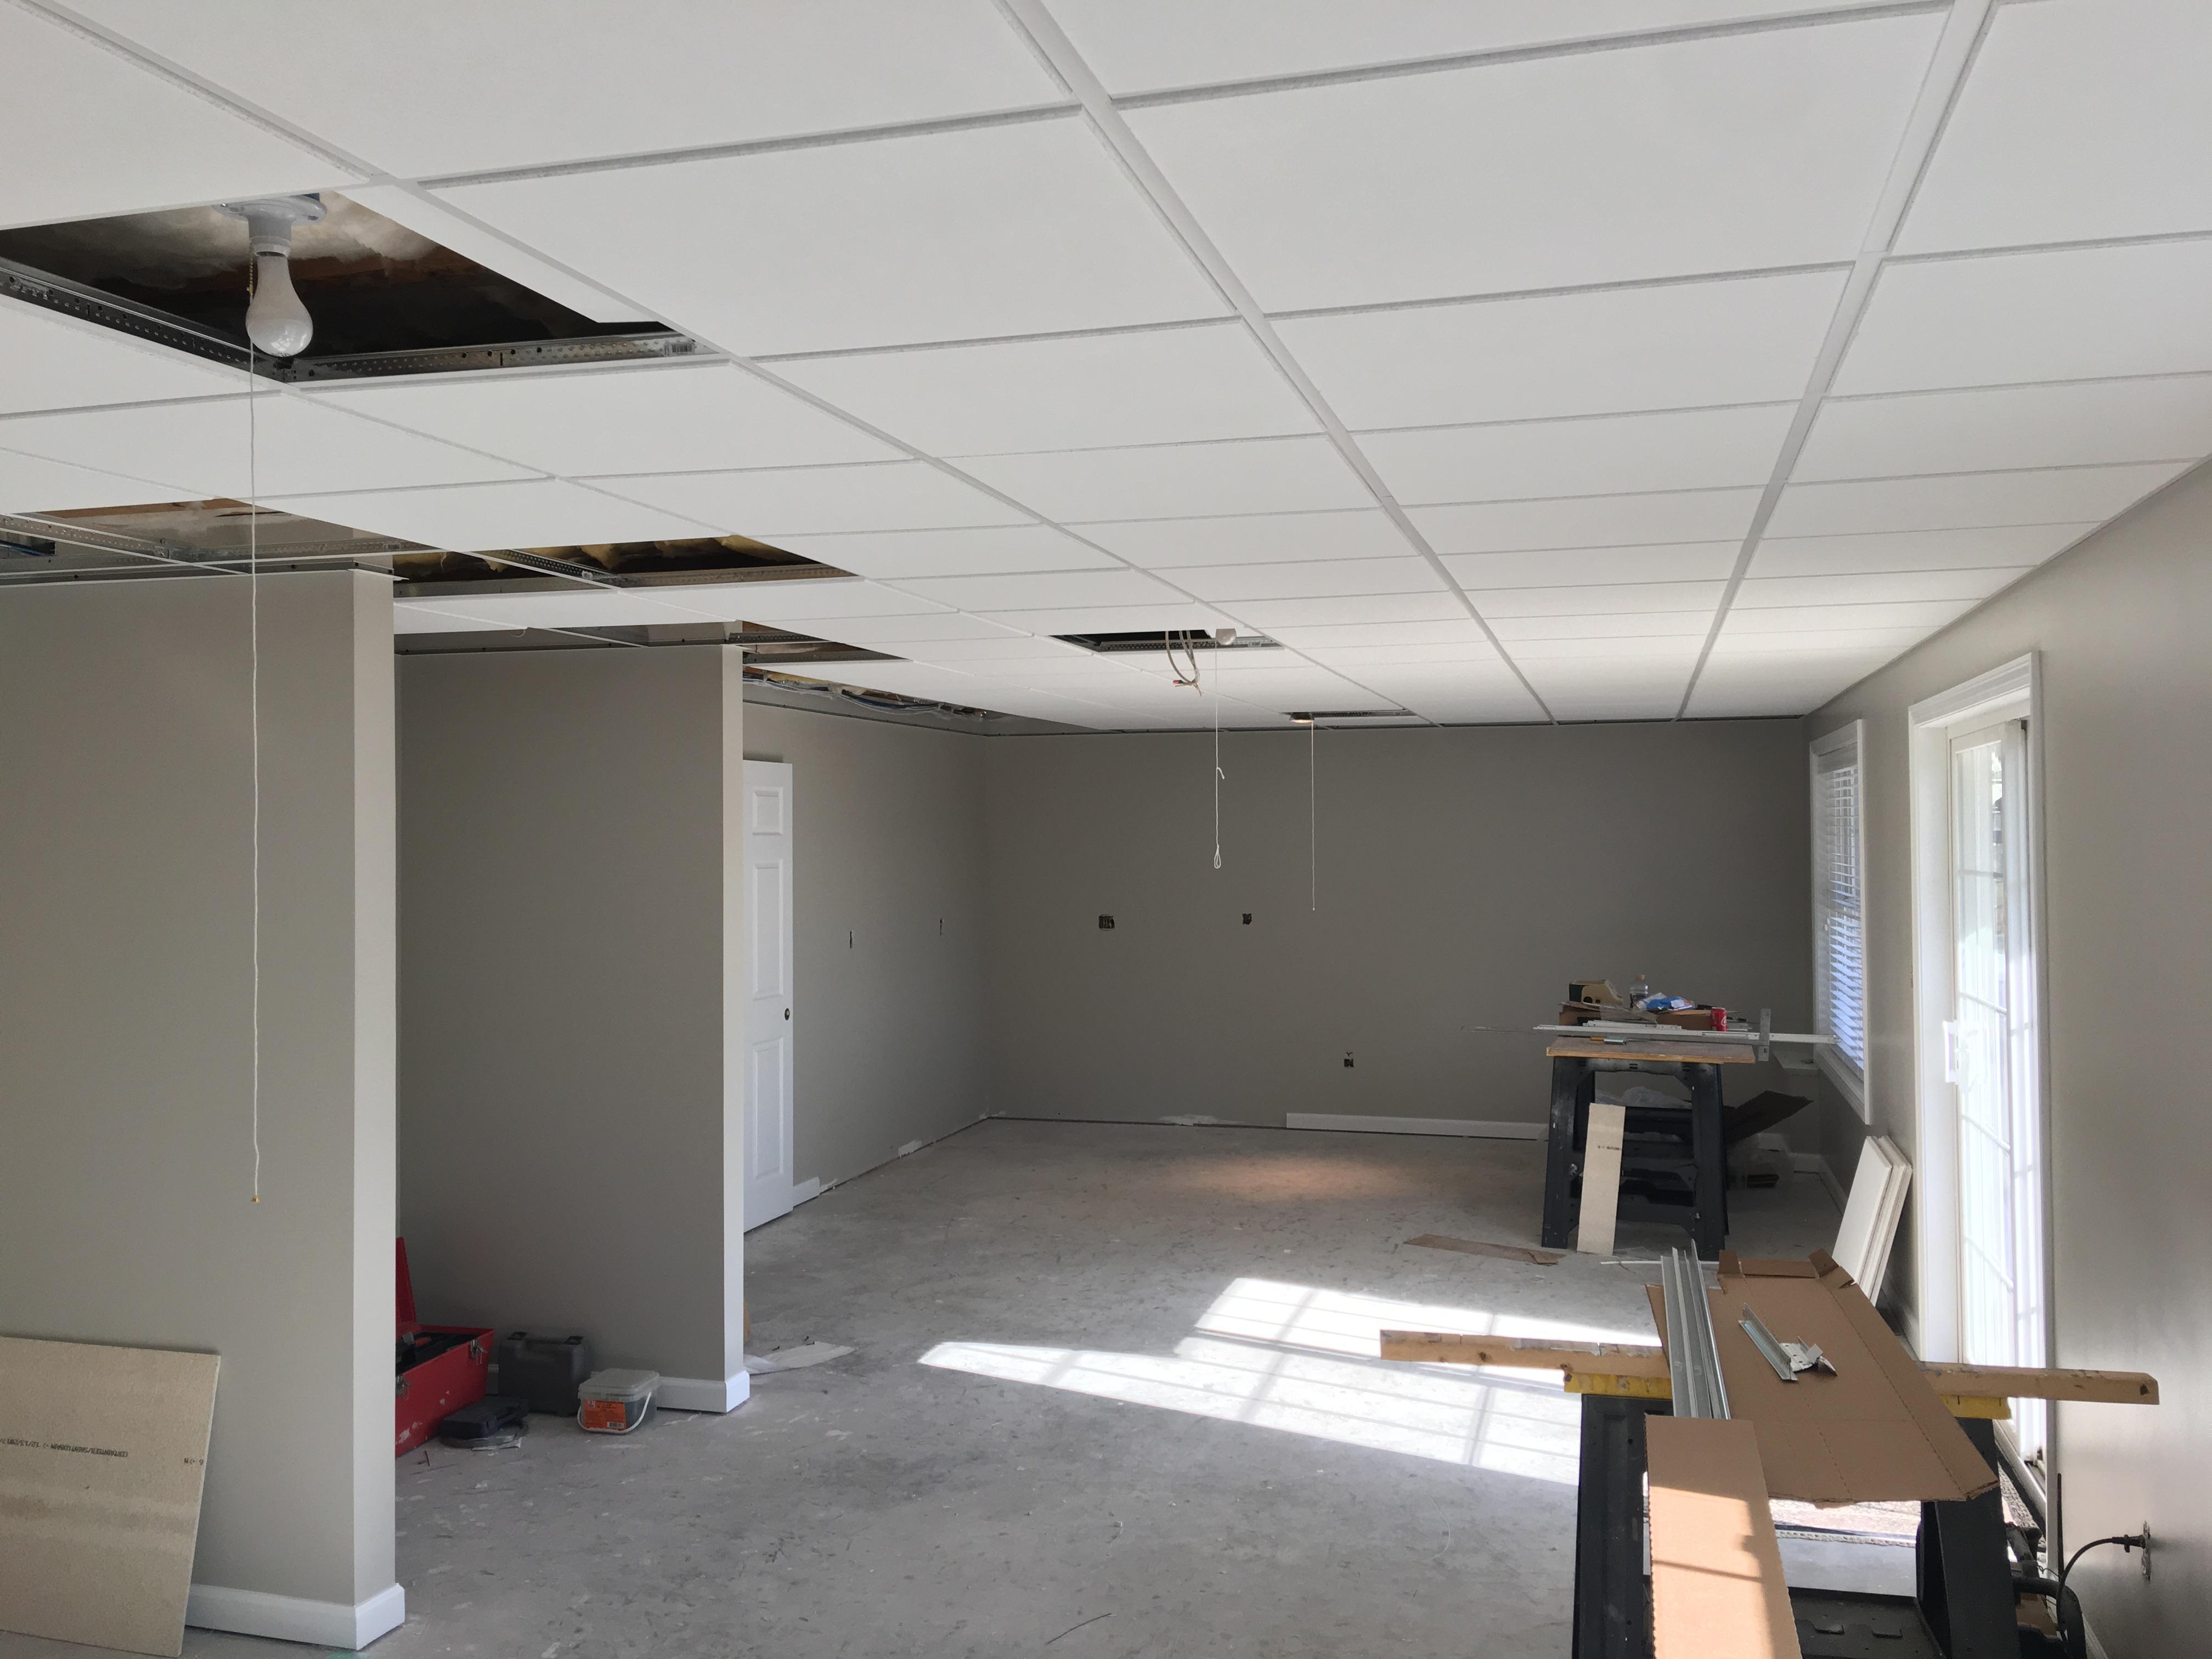 Finished basement-ed71256c-5c0b-4a22-bcb2-2d8d0f80f3f6.jpeg